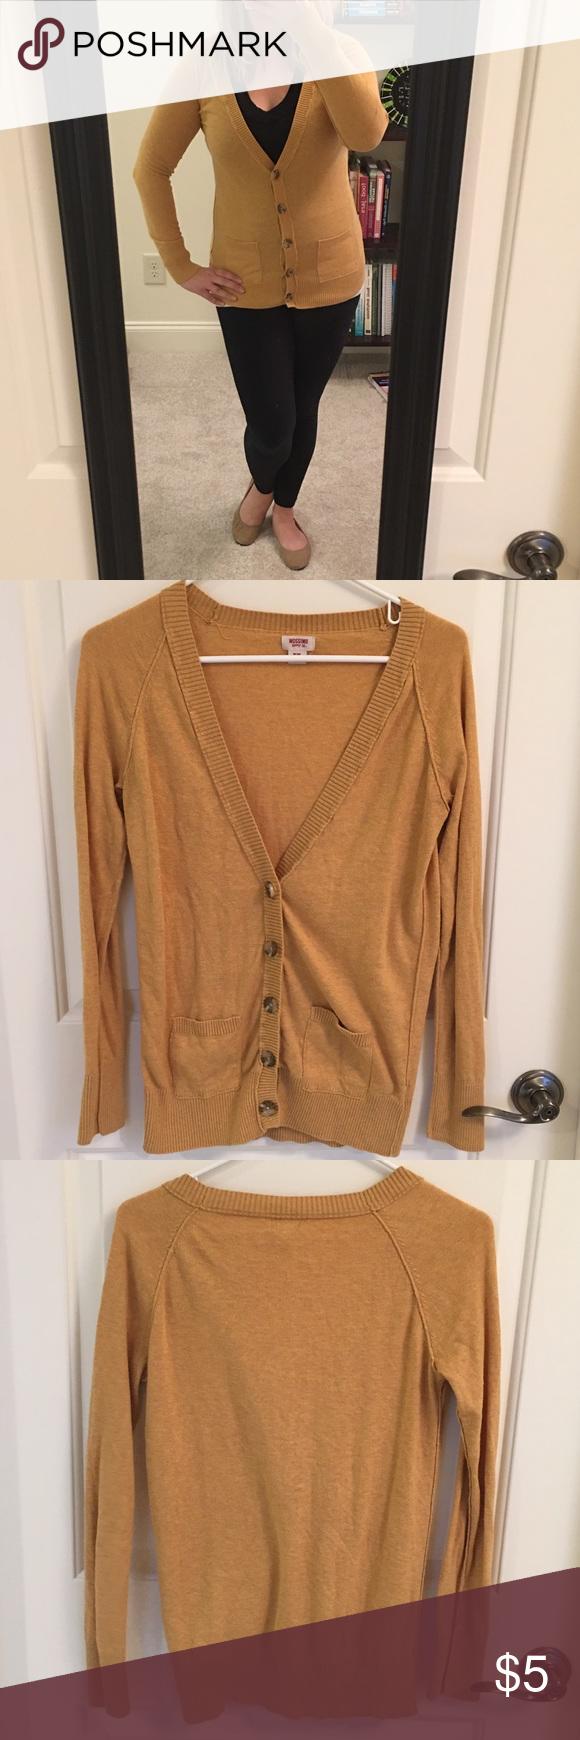 Yellow Boyfriend Cardigan | Sweater cardigan, Boyfriend cardigan ...